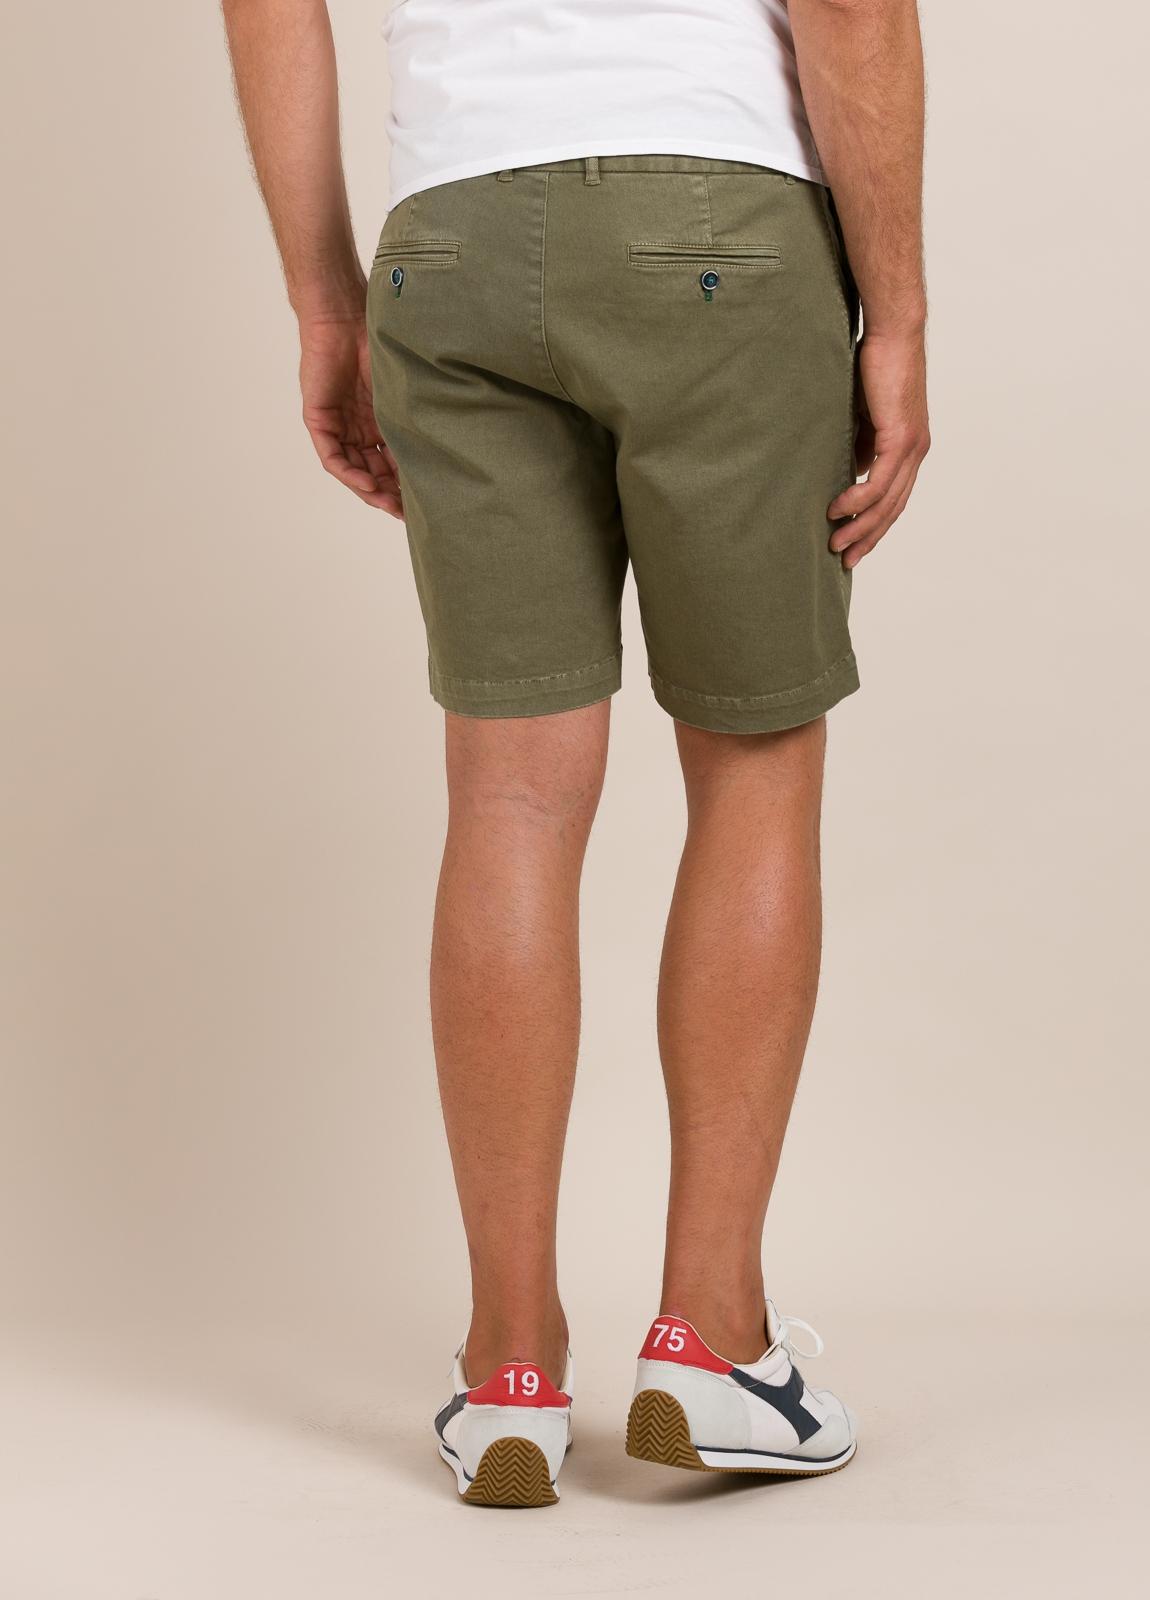 Bermuda modelo THOMAS color kaki, 100% Algodón. - Ítem2